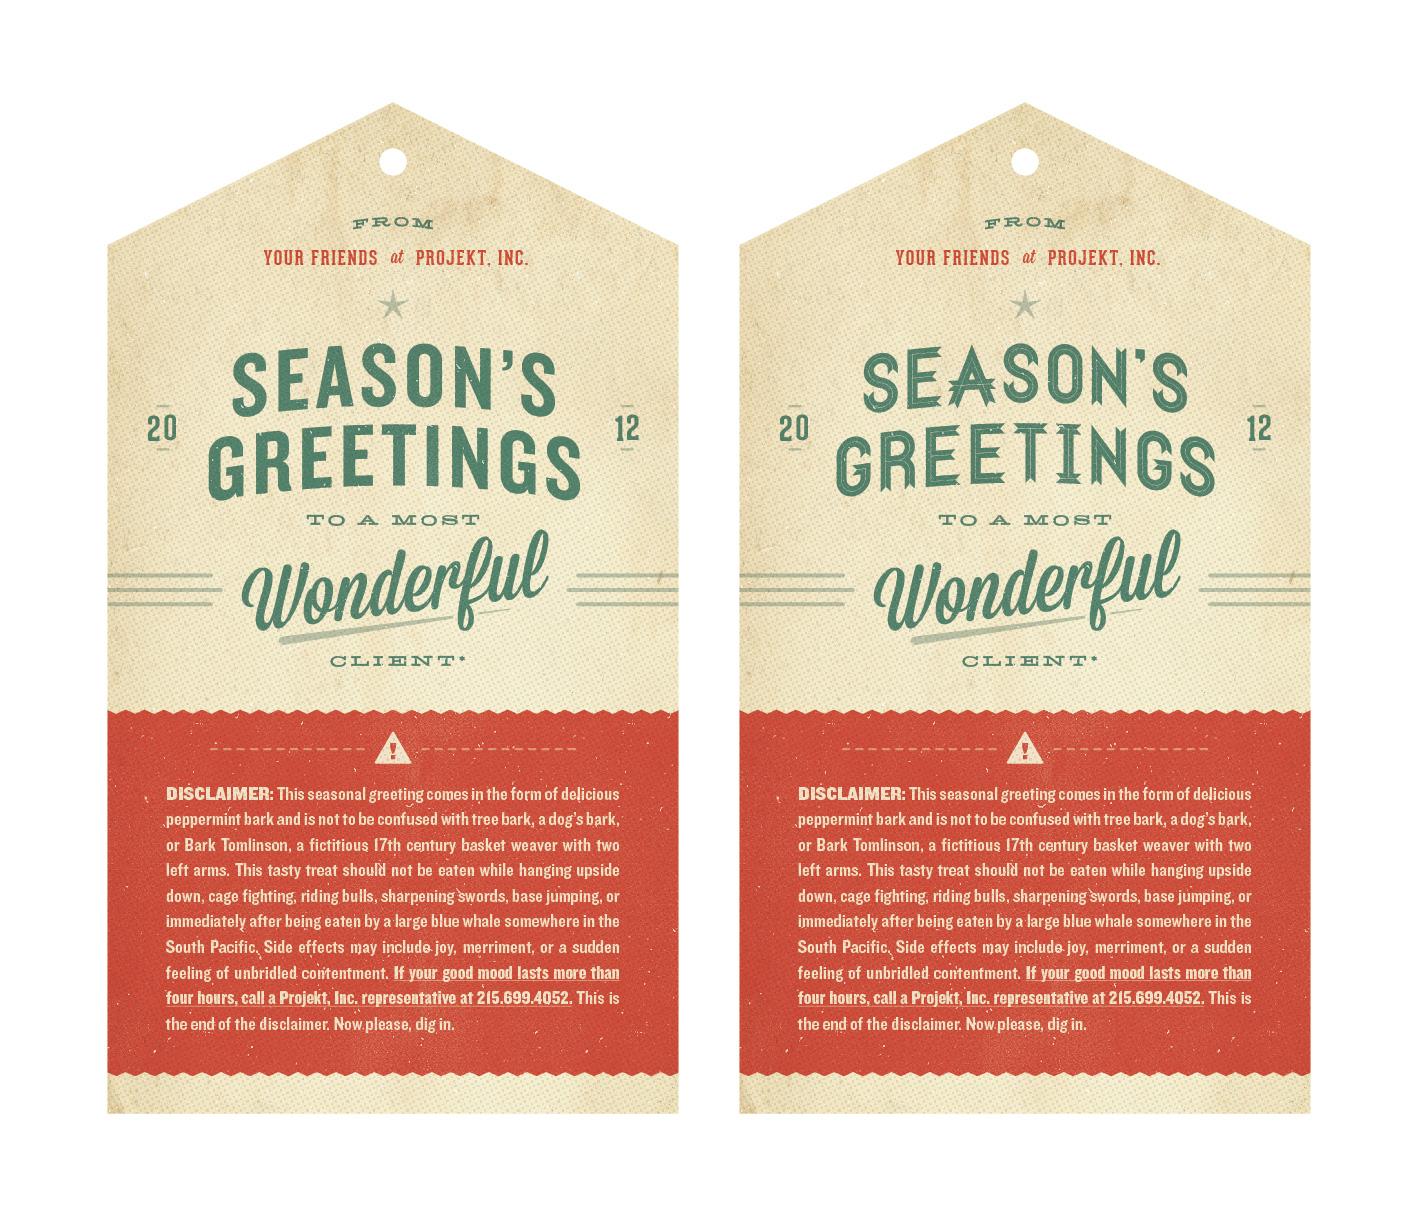 Seasons greetings lg 2